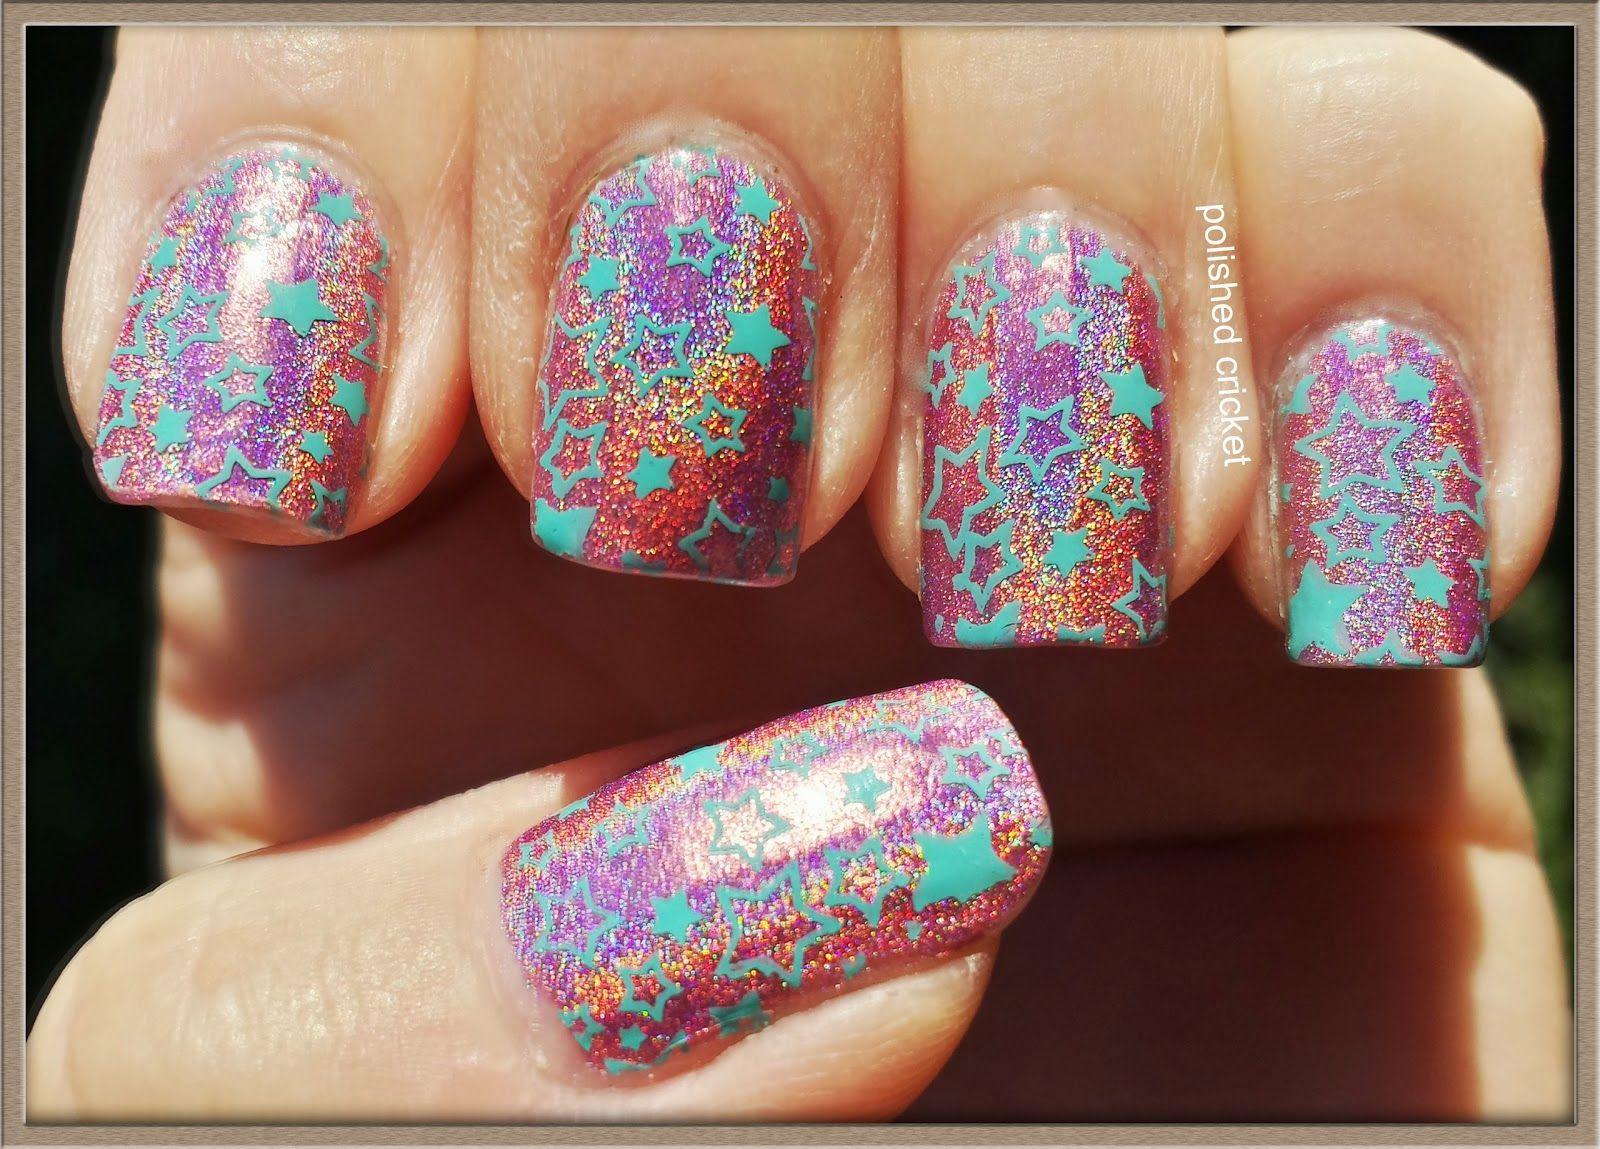 Konad m94 | Stamping nail art | Pinterest | Stamping nail art, Konad ...